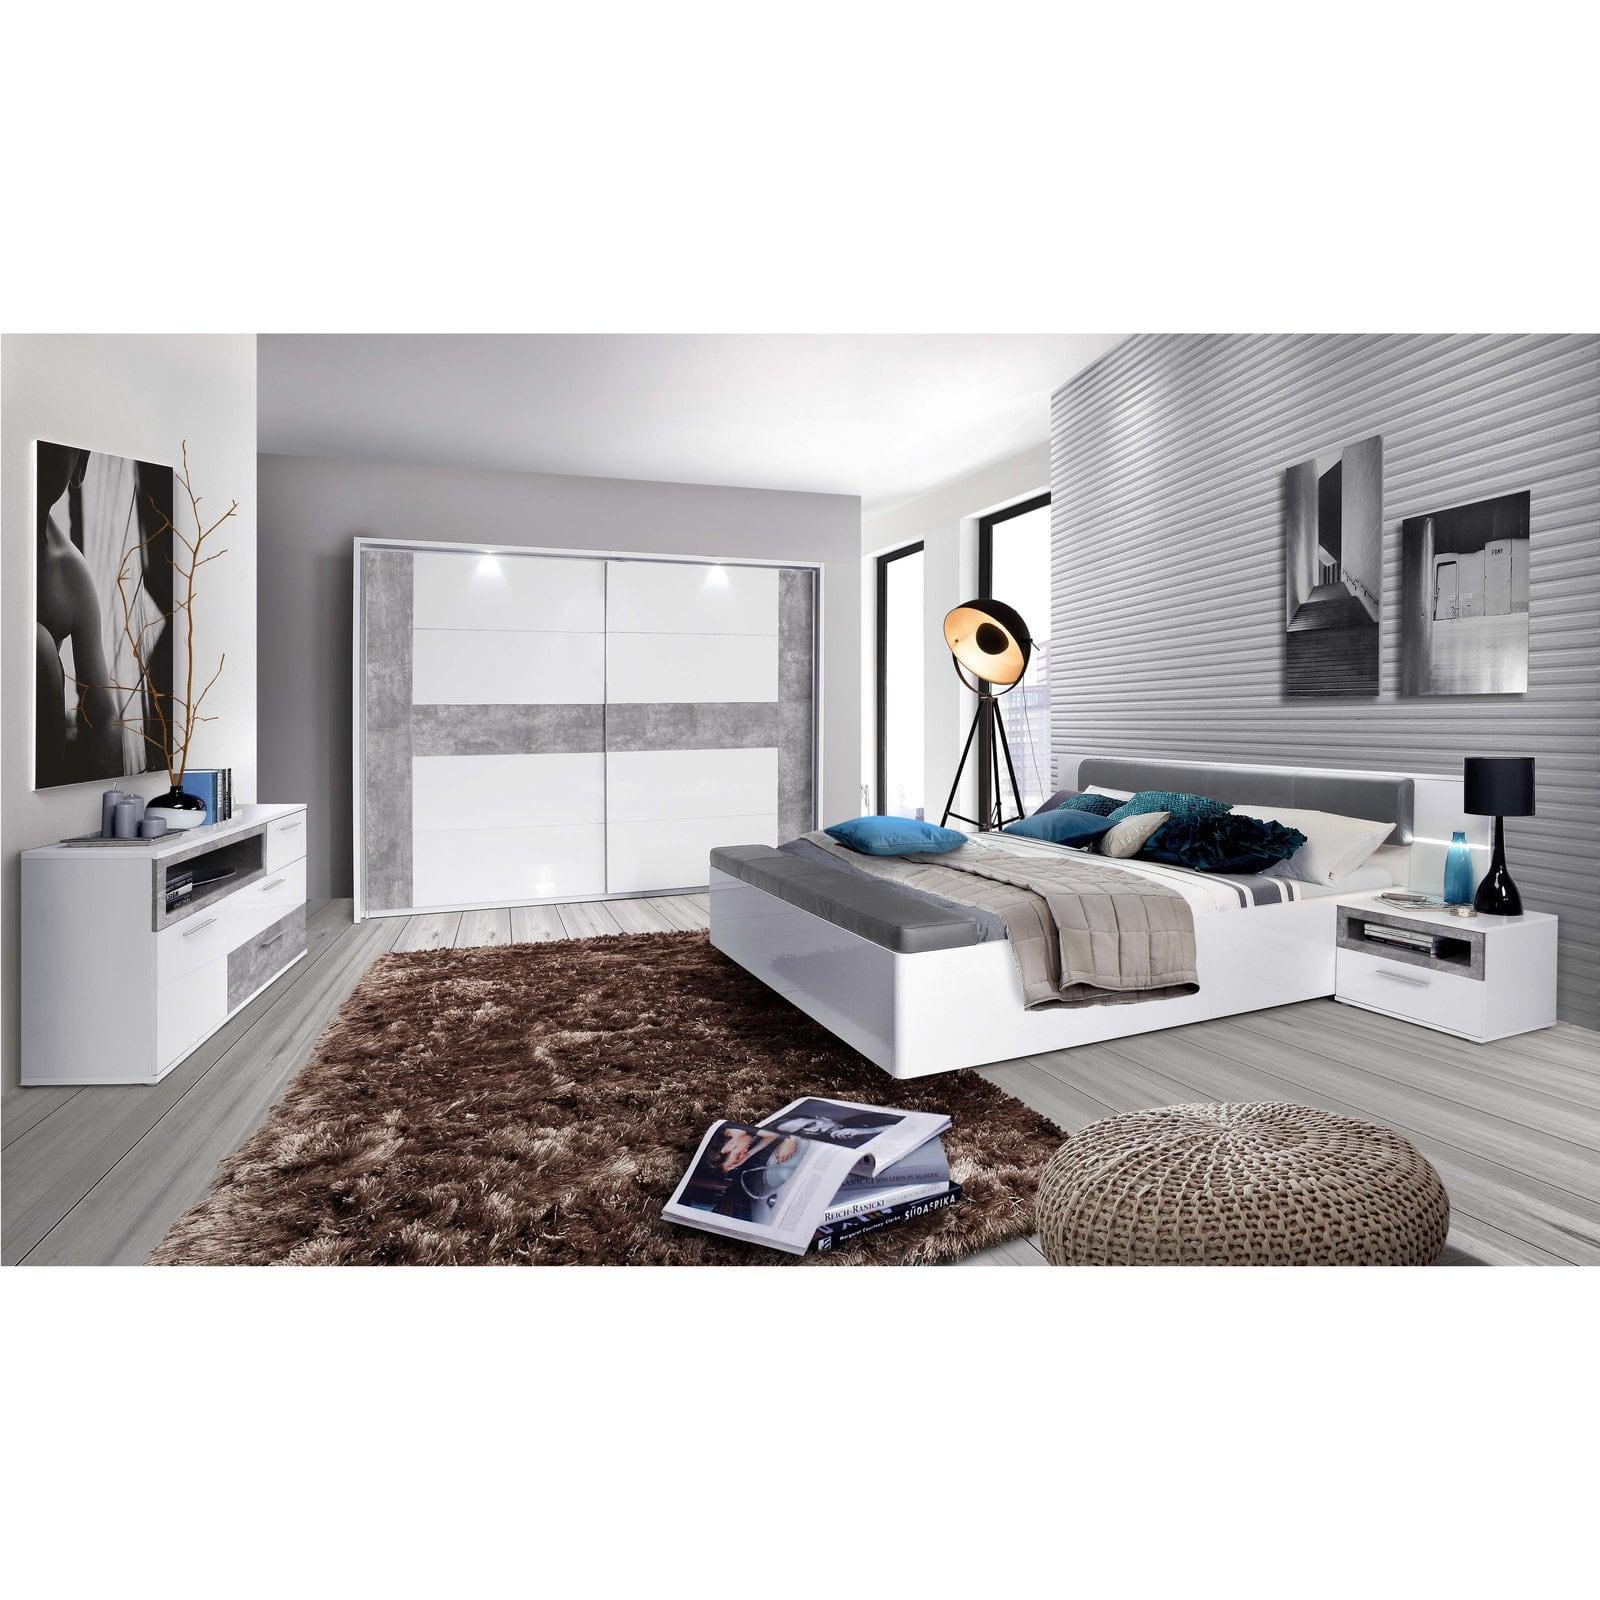 Ella@HOME Bett - grau-weiß Hochglanz - Kunstleder - Beleuchtung - Fußbank -  180x200 cm